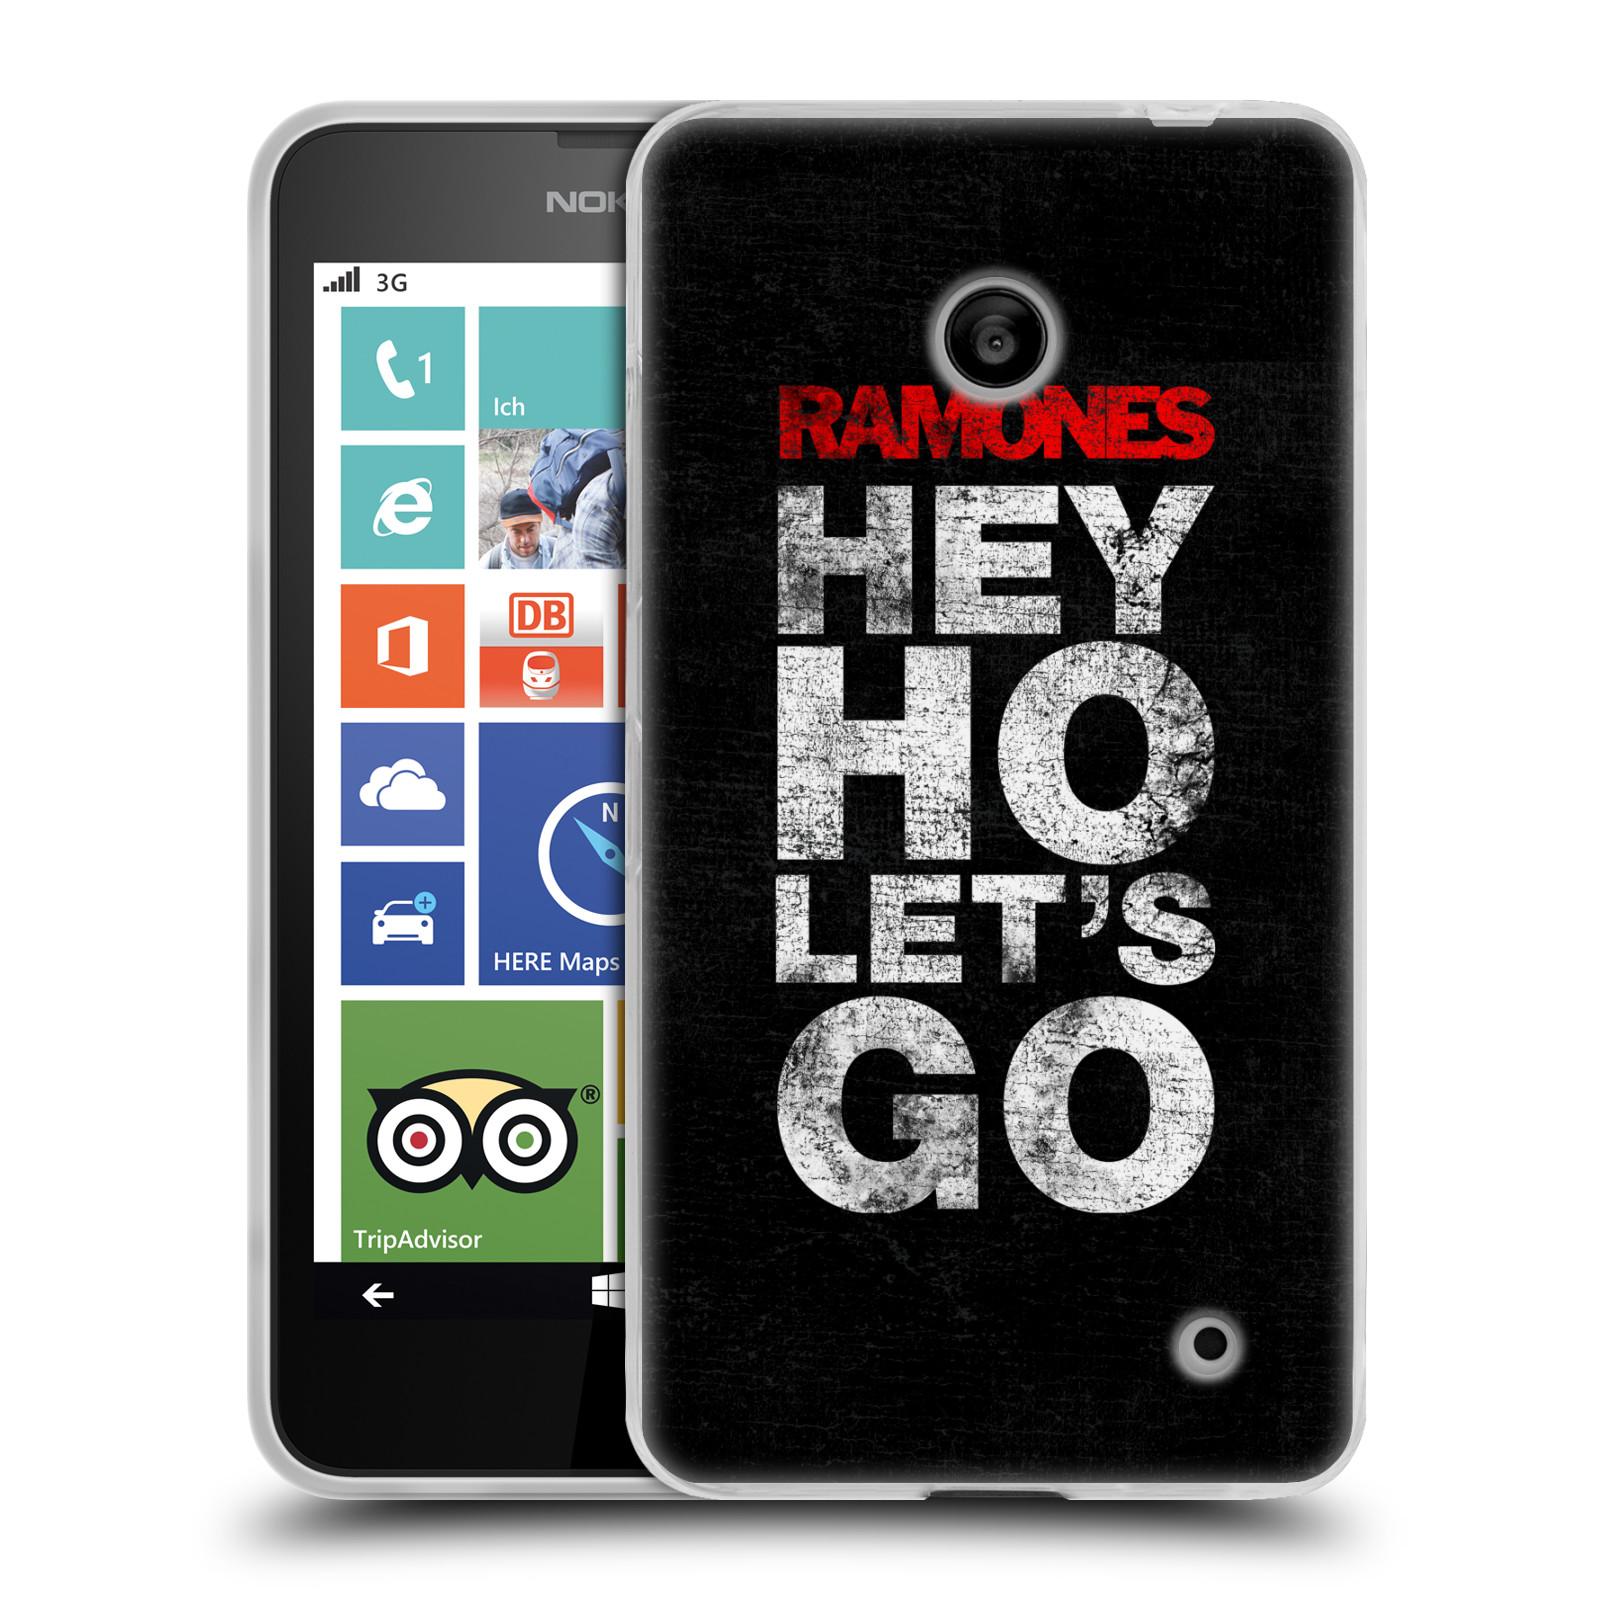 Silikonové pouzdro na mobil Nokia Lumia 635 HEAD CASE The Ramones - HEY HO LET´S GO (Silikonový kryt či obal na mobilní telefon s oficiálním licencovaným motivem The Ramones pro Nokia Lumia 635 Dual SIM)